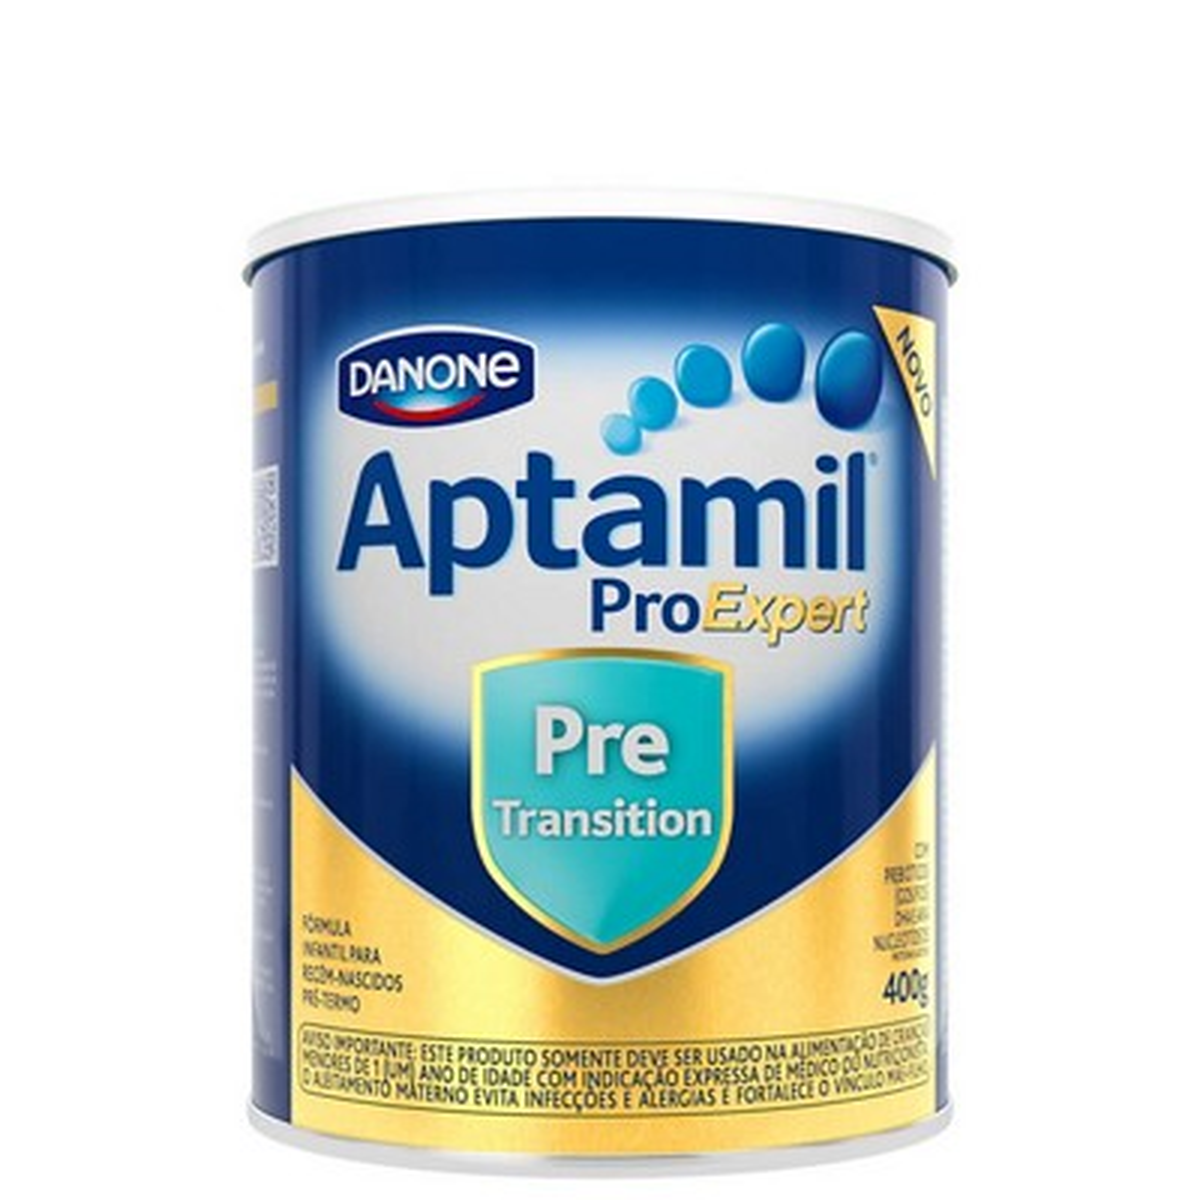 APTAMIL PROEXPERT PRE PRETRANSITION